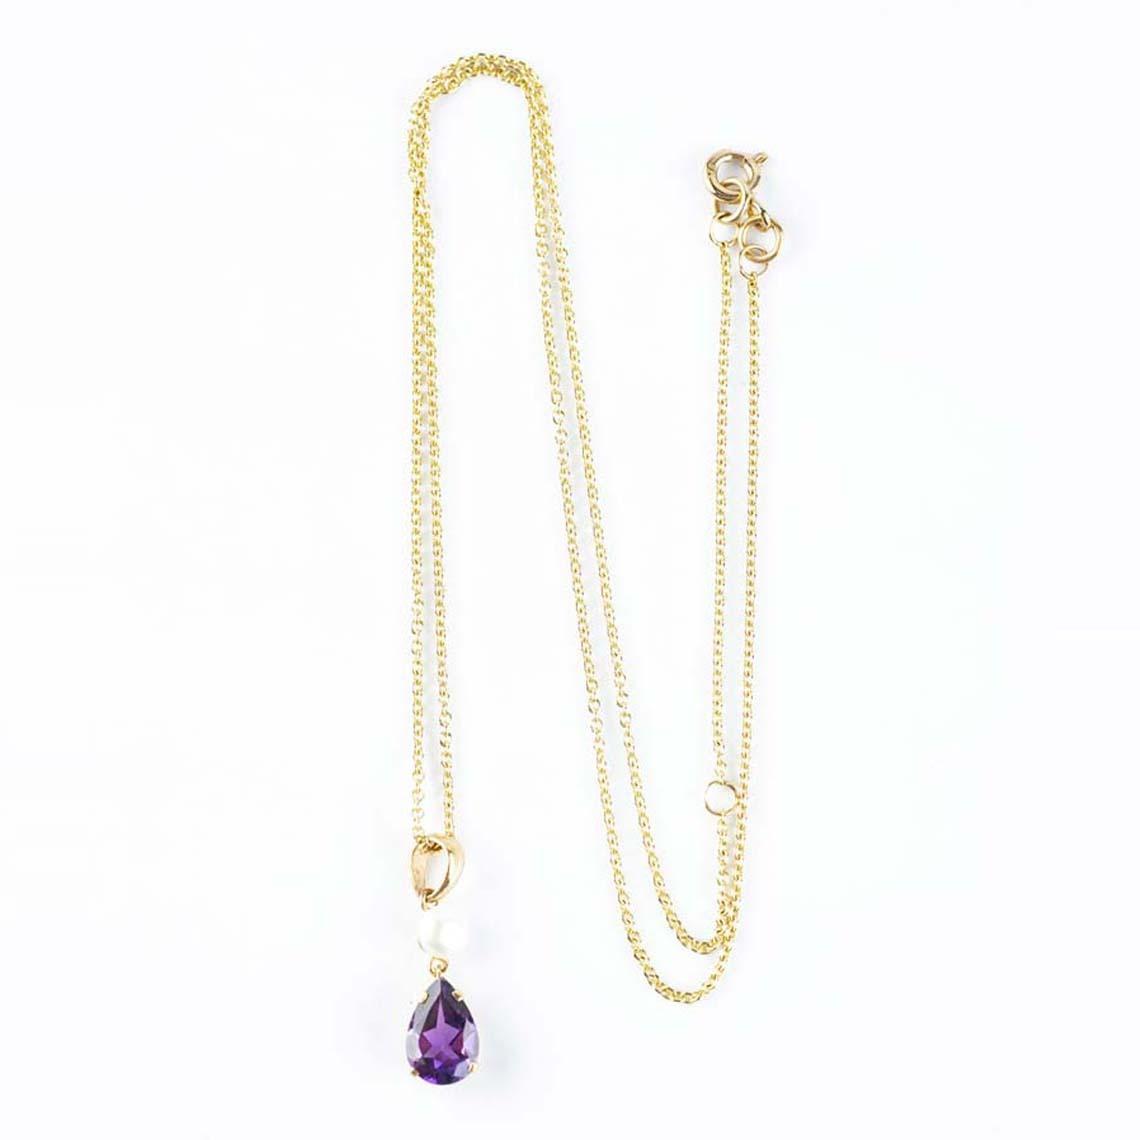 Amethyst pearl pendant